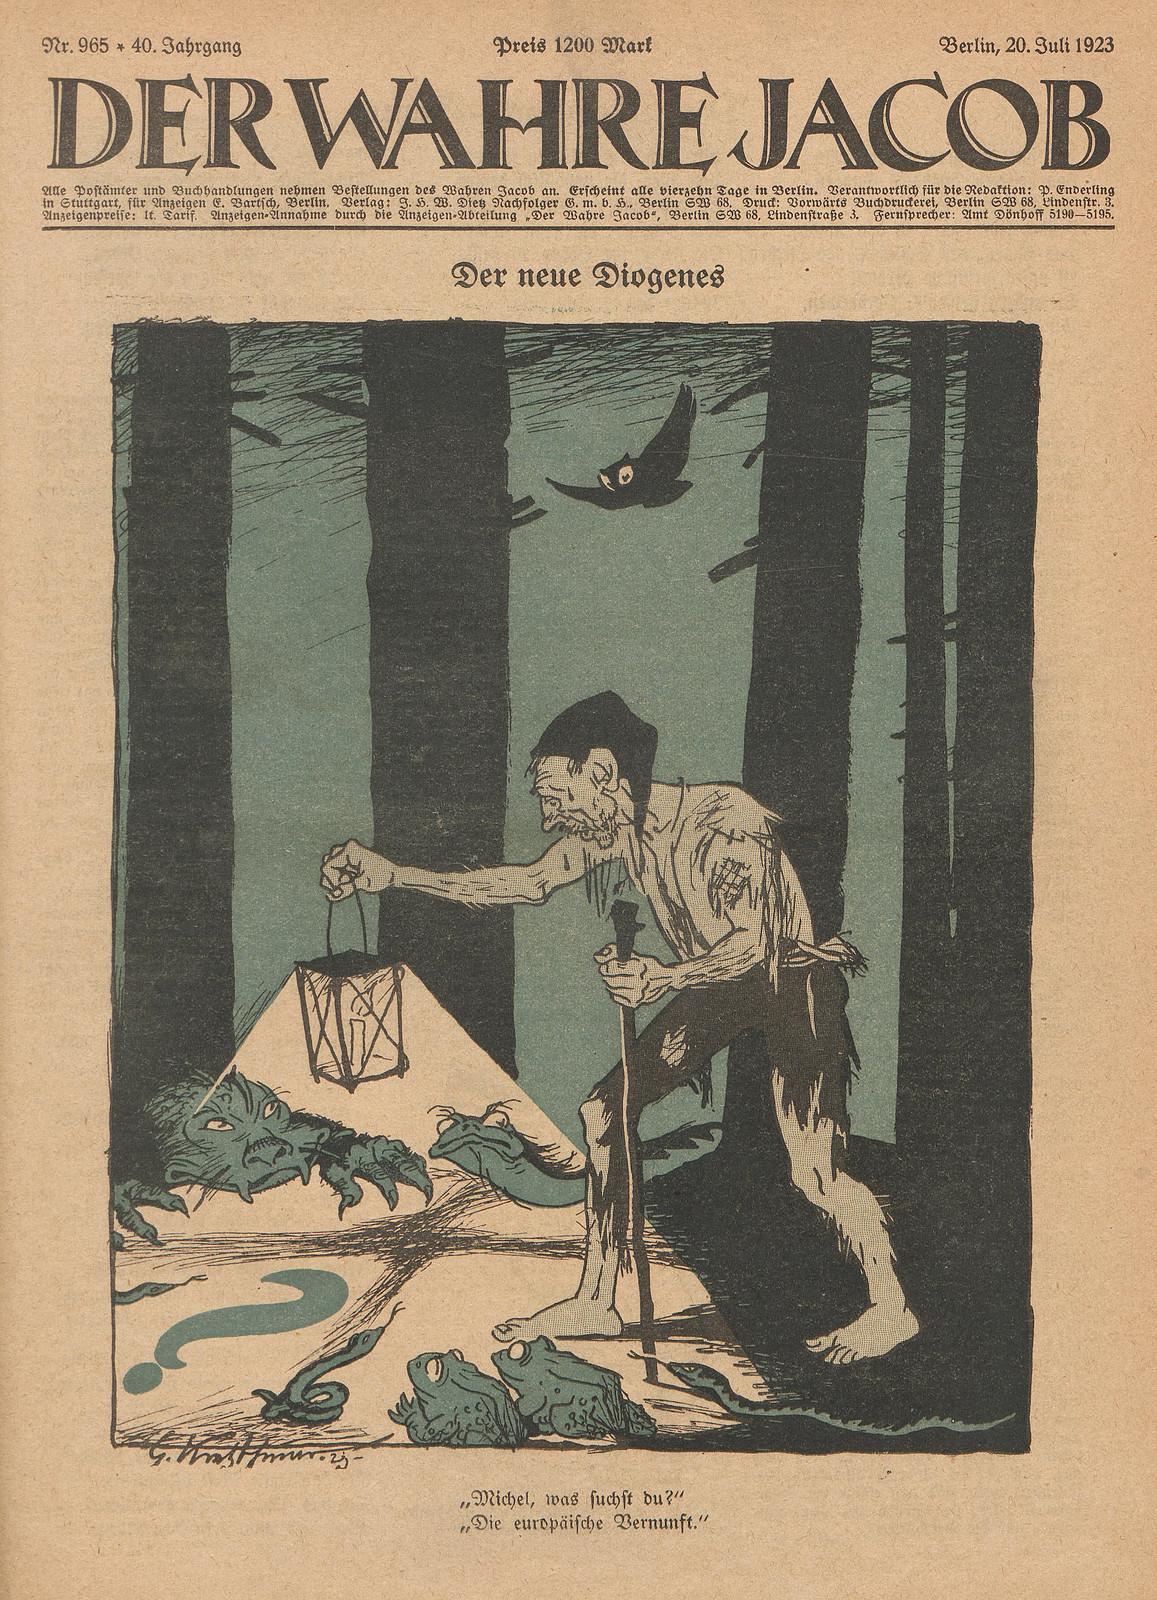 Georg Kretzschmar - The New Diogenes, 1923